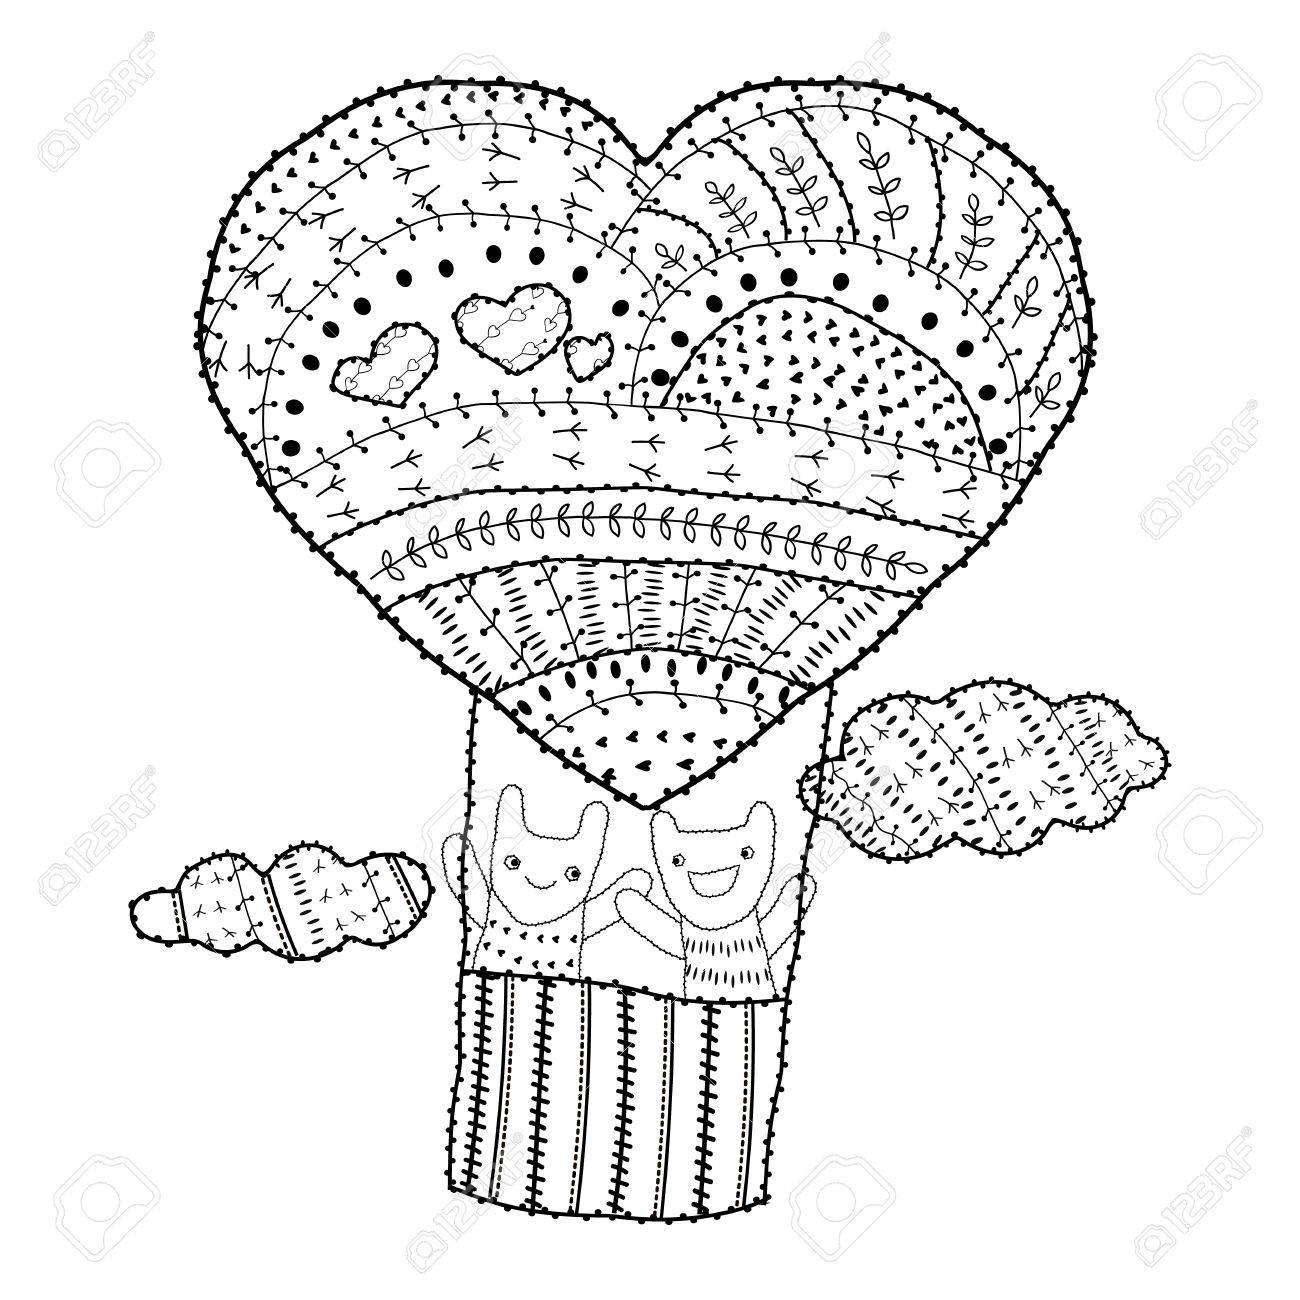 Coloriage Ballon En Coeur.Adulte Coloriage En Forme De Coeur Ballon A Air Chaud Deux Amis